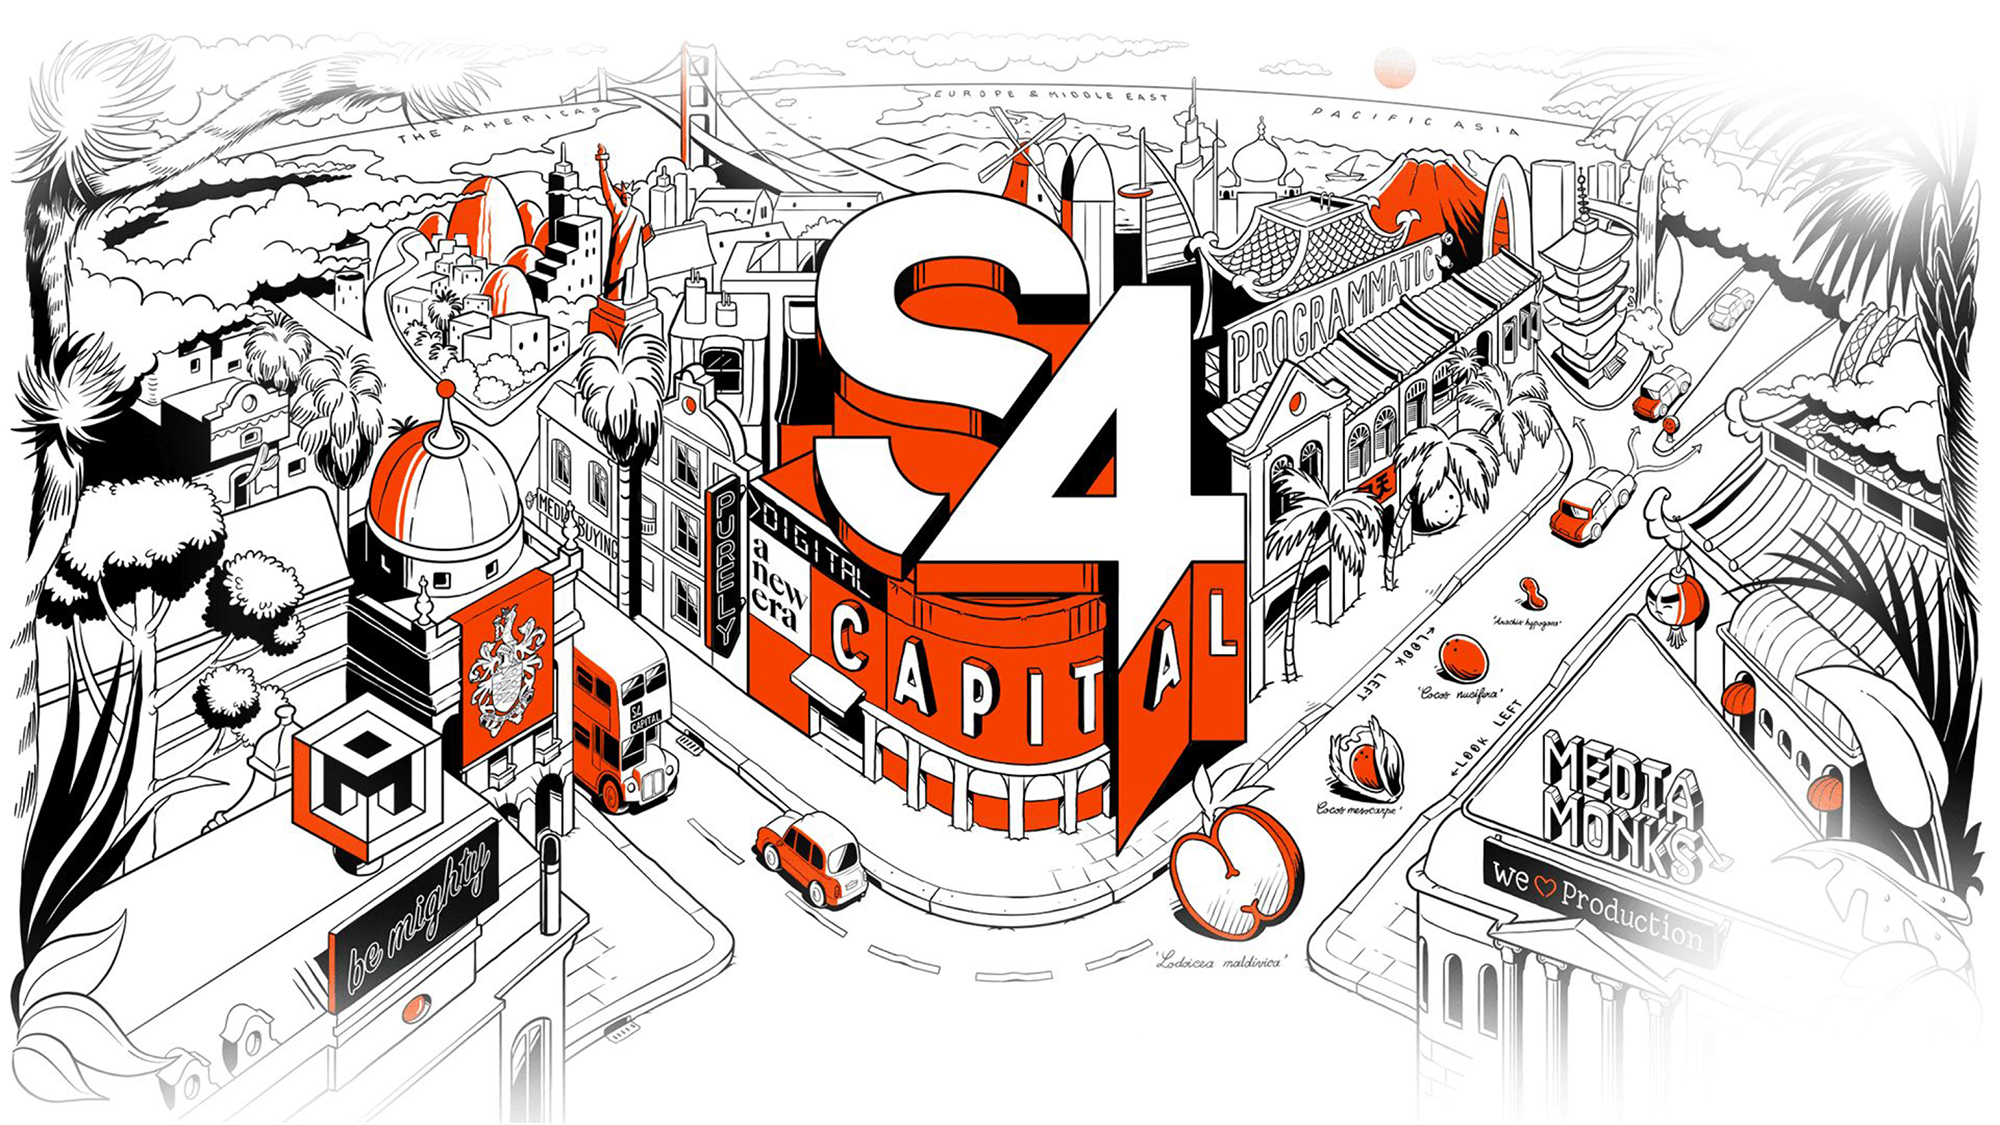 S4-Capital-mediamonks-logo-pattern-identity-photo-sir-martin-sorrell-trading-update